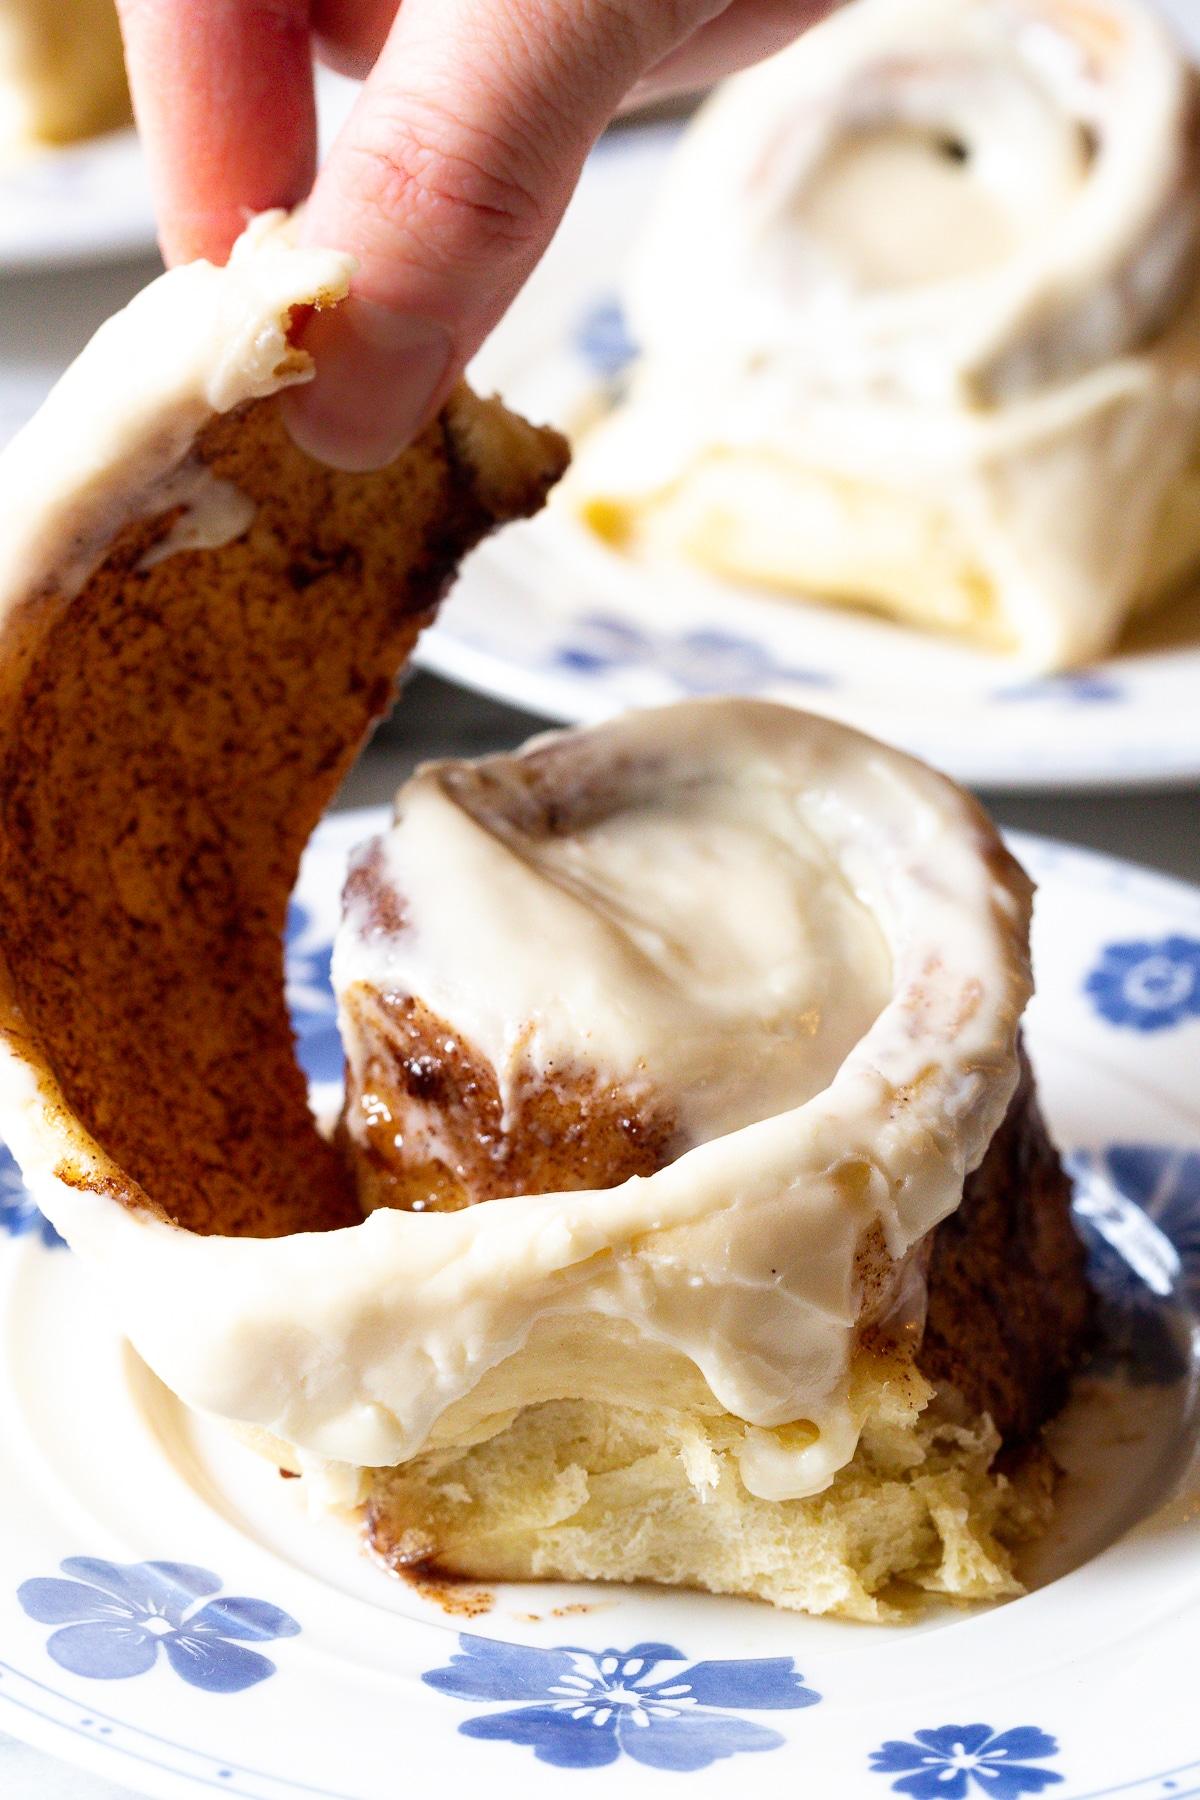 Cinnabon Recipe #ASpicyPerspective #CinnamonRolls #CinnamonRollRecipe #HowtoMakeCinnamonRolls #Cinnabon #Dessert #Breakfast #Cinnamon #Homemade